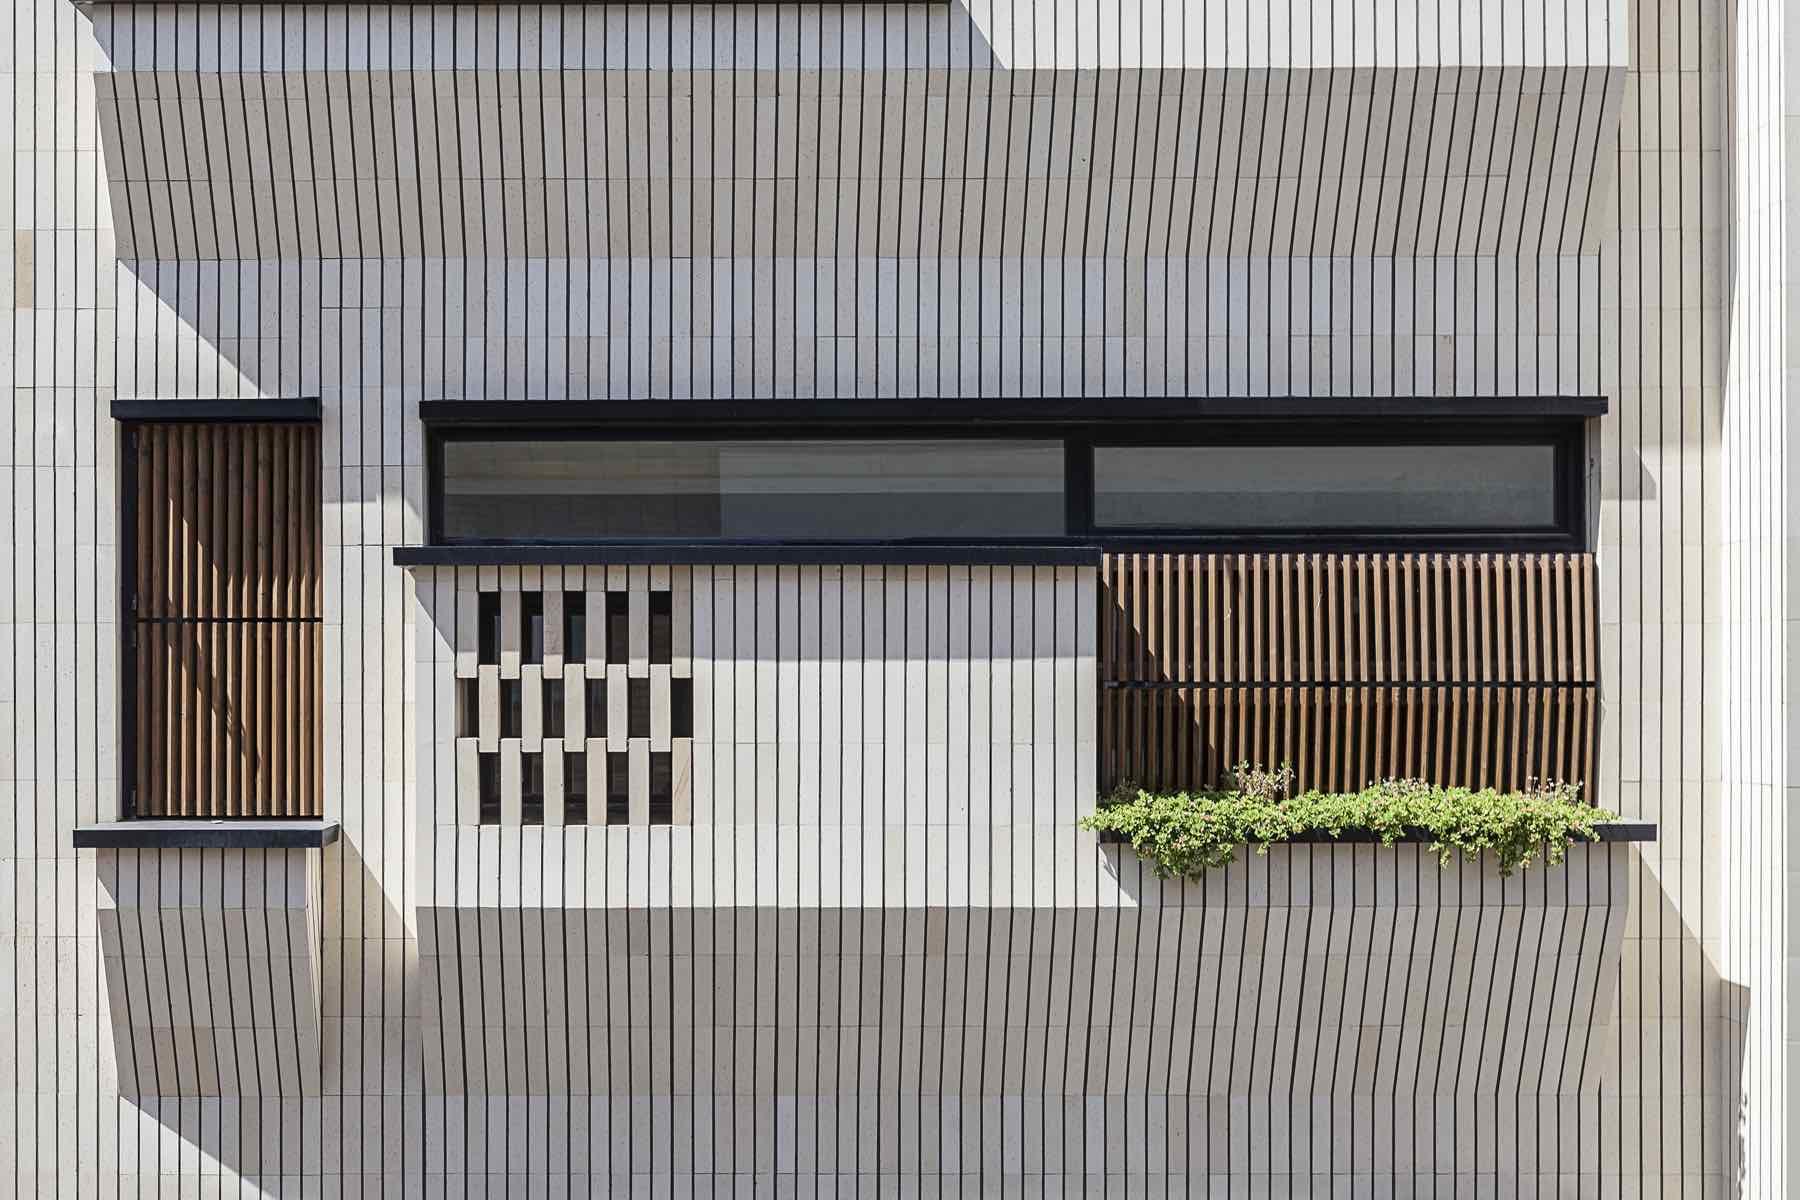 Rouzan_Residential_Building_Sayed_hamed_jafari_Charchoob_Architecture_Office_005.jpg